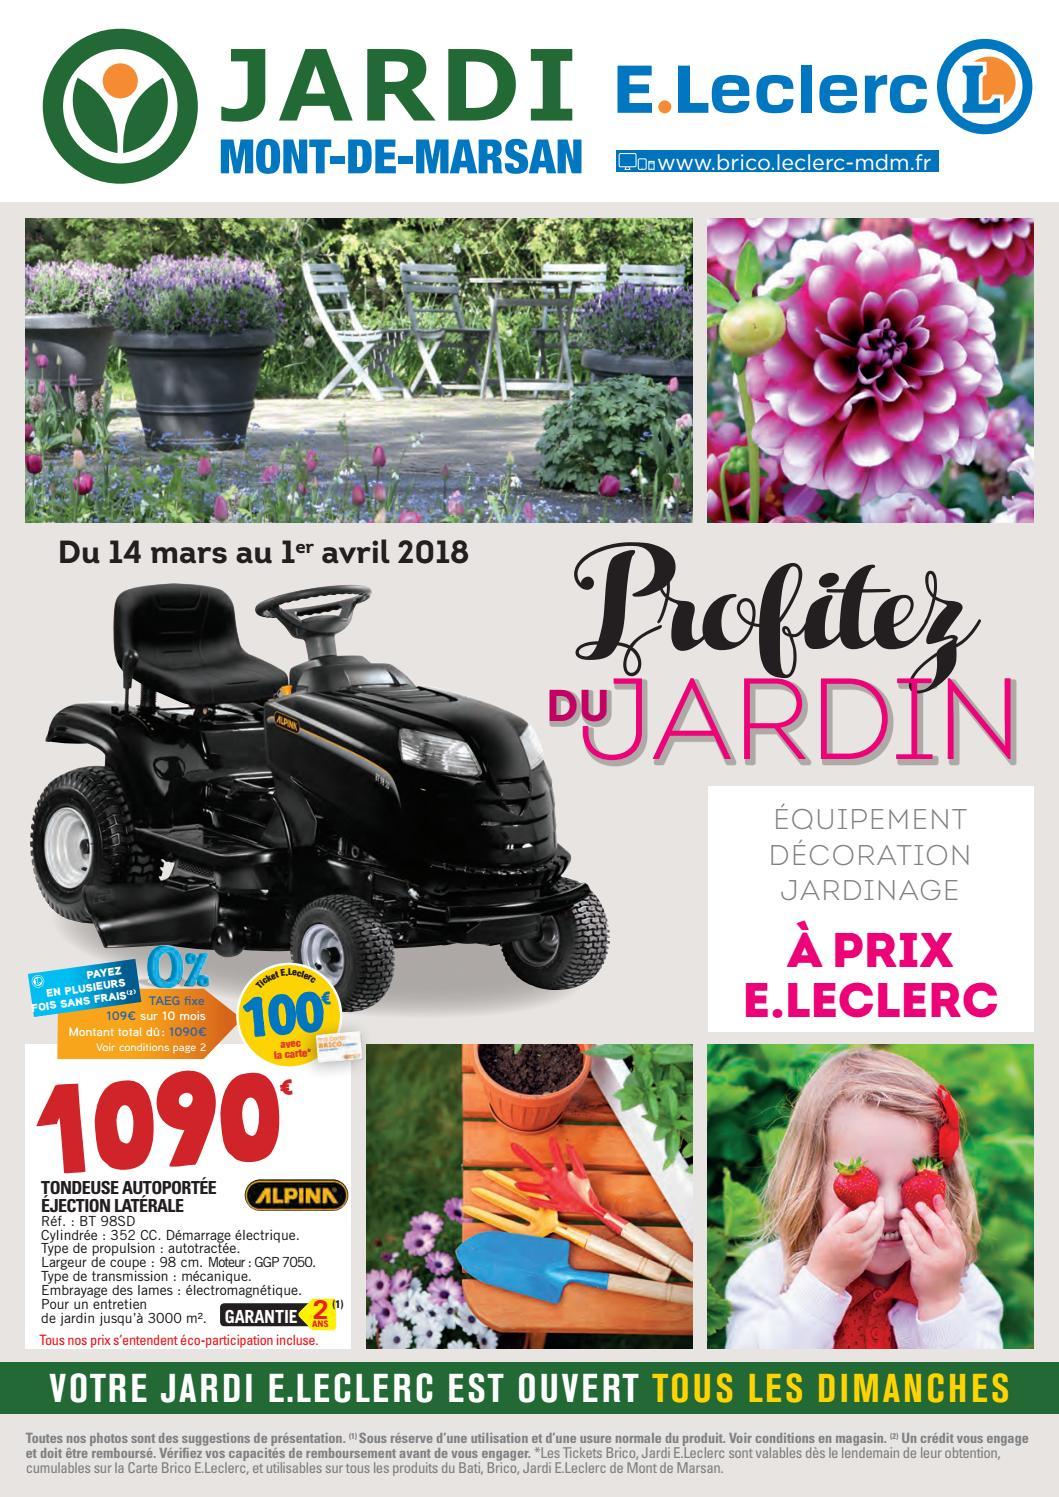 Catalogue Jardin - Jardi E.leclerc By Chou Magazine - Issuu serapportantà Tonnelle De Jardin Leclerc